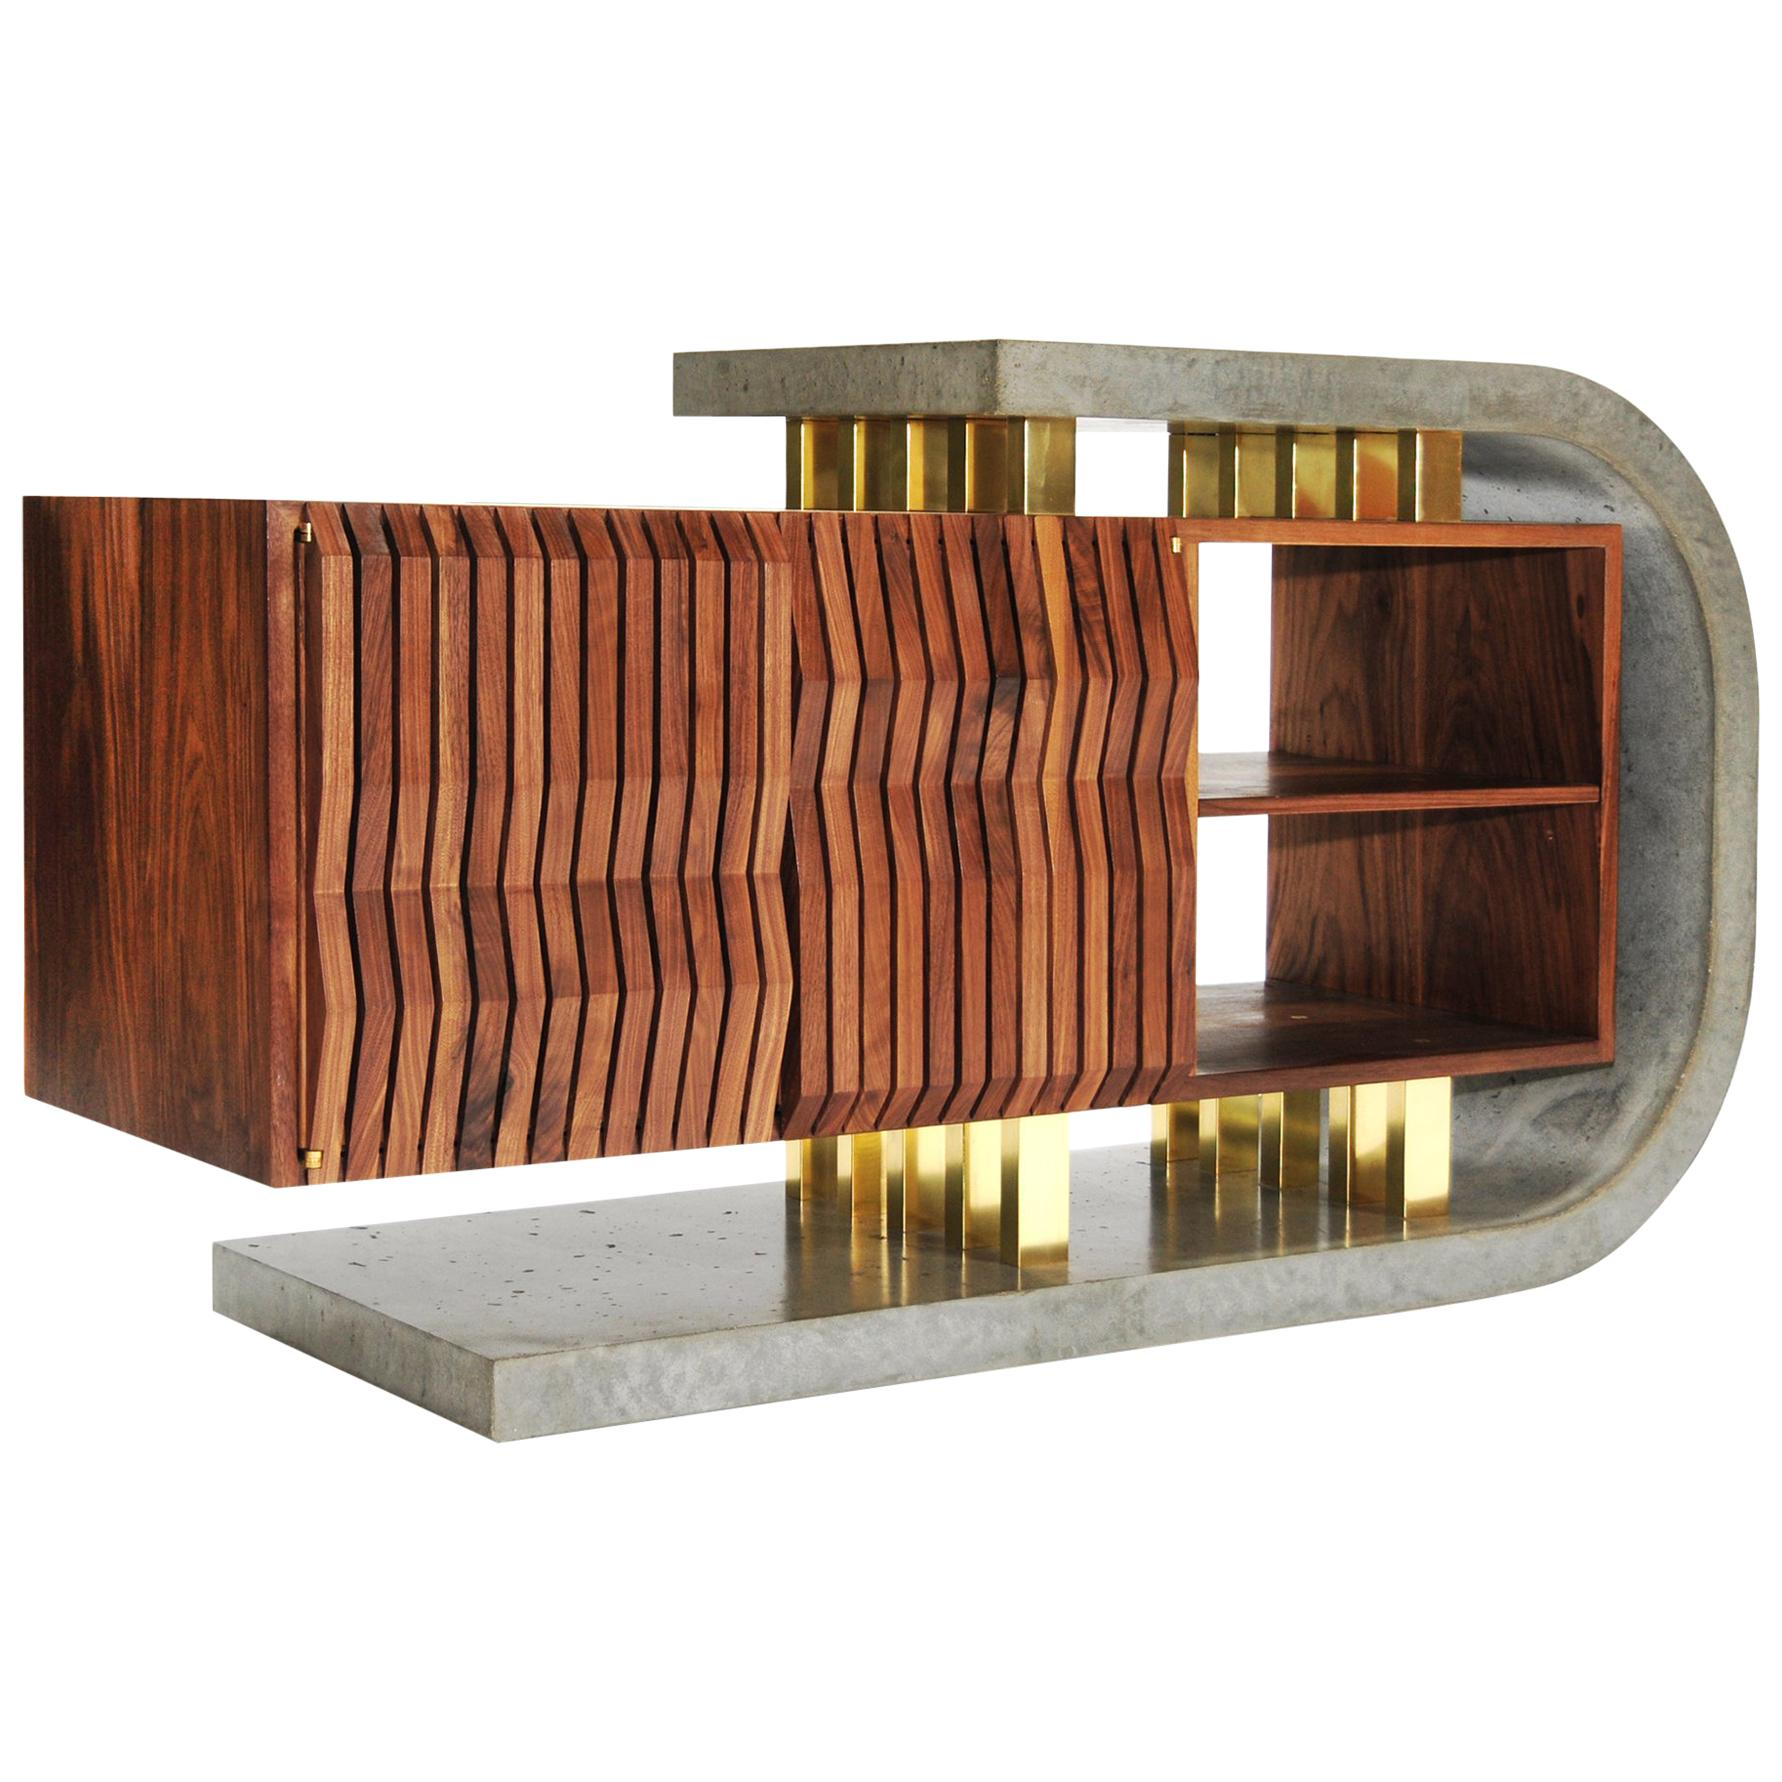 Brutalist Modern Walnut Concrete and Brass Audiophile Sideboard Credenza